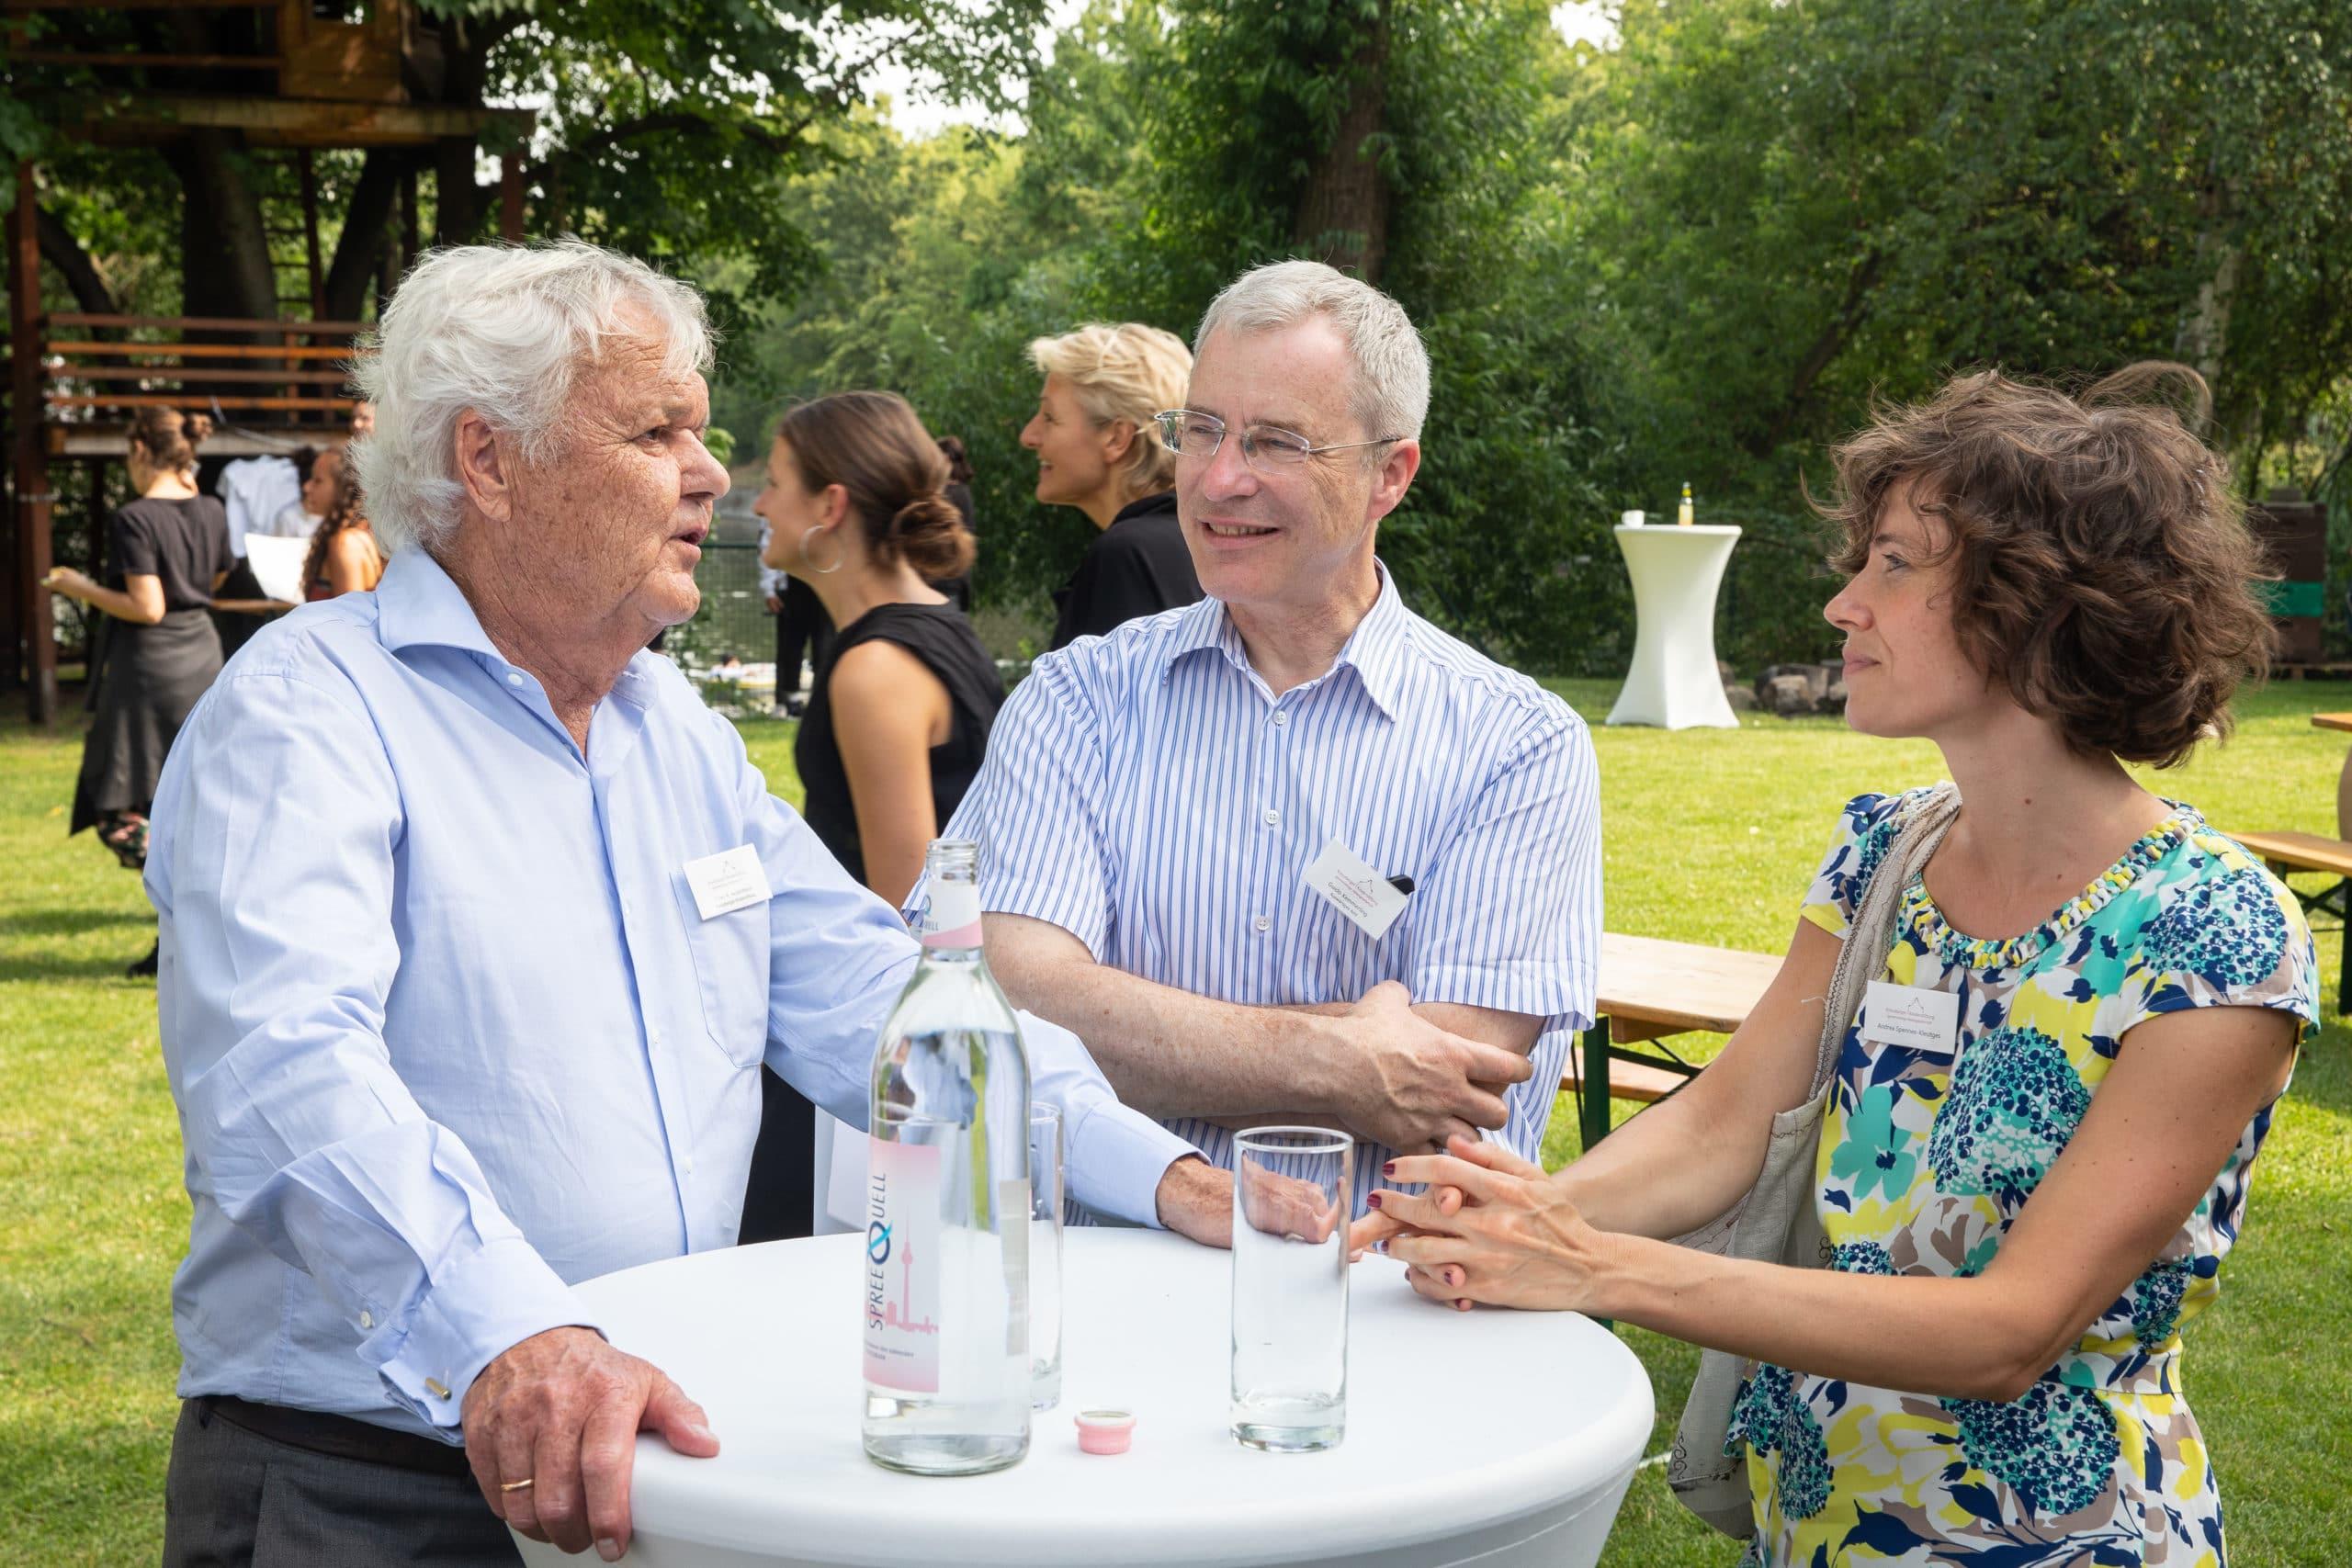 Peter Ackermann, Guido Kemmerling und Andrea Spennes-Kleutges - Stipendienverleihung 2019